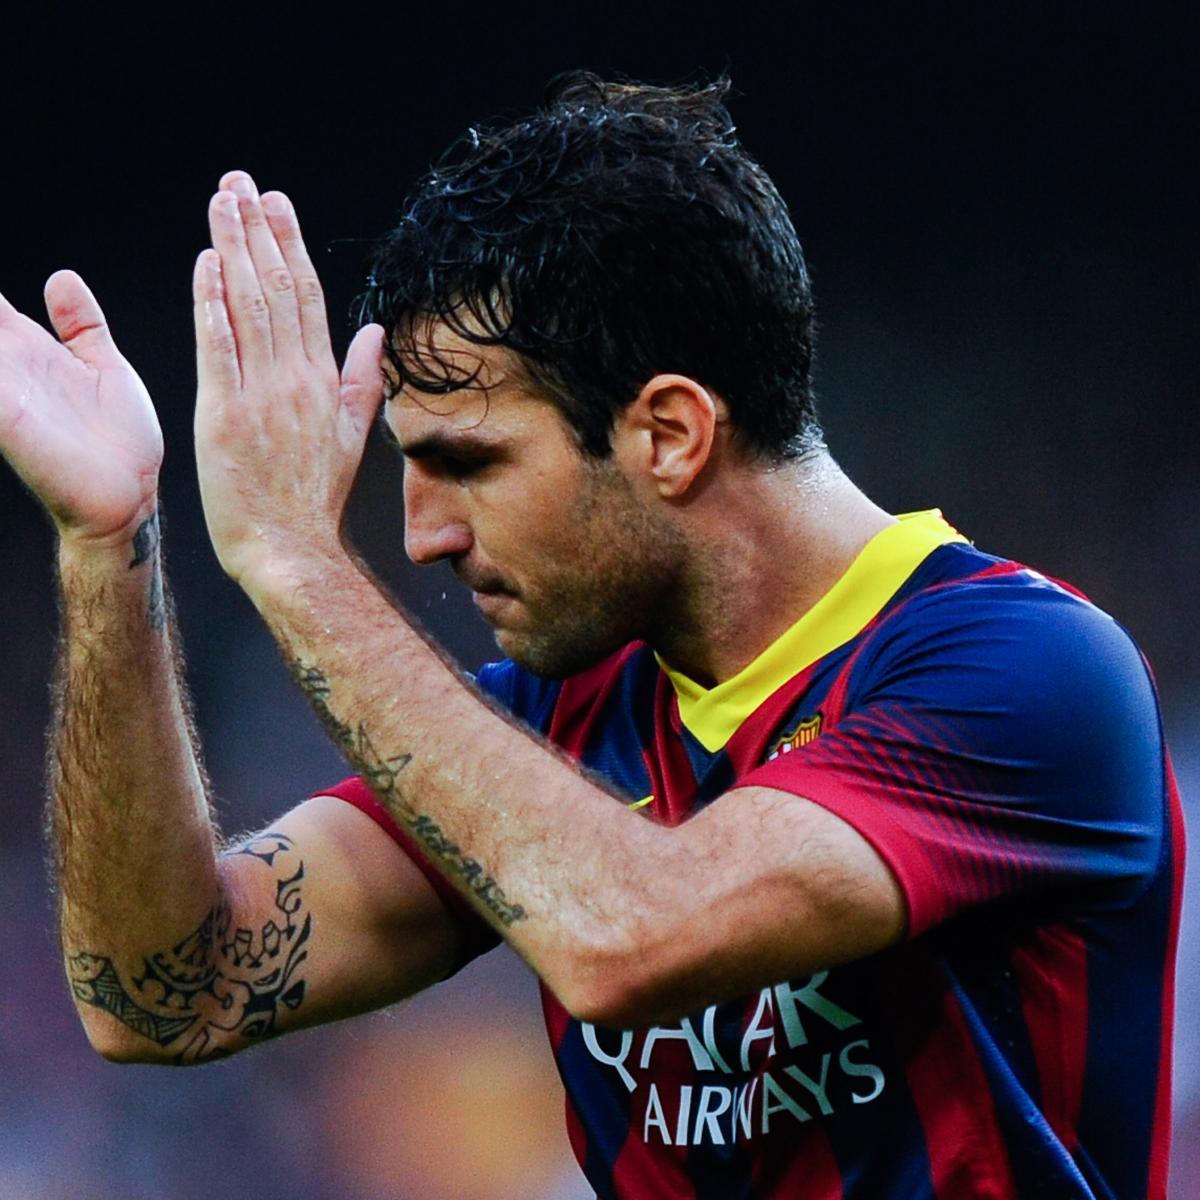 Celta Vigo Vs Barcelona Live Commentary: GIF: Cesc Fabregas Needs Luck To Finish Amazing Barcelona